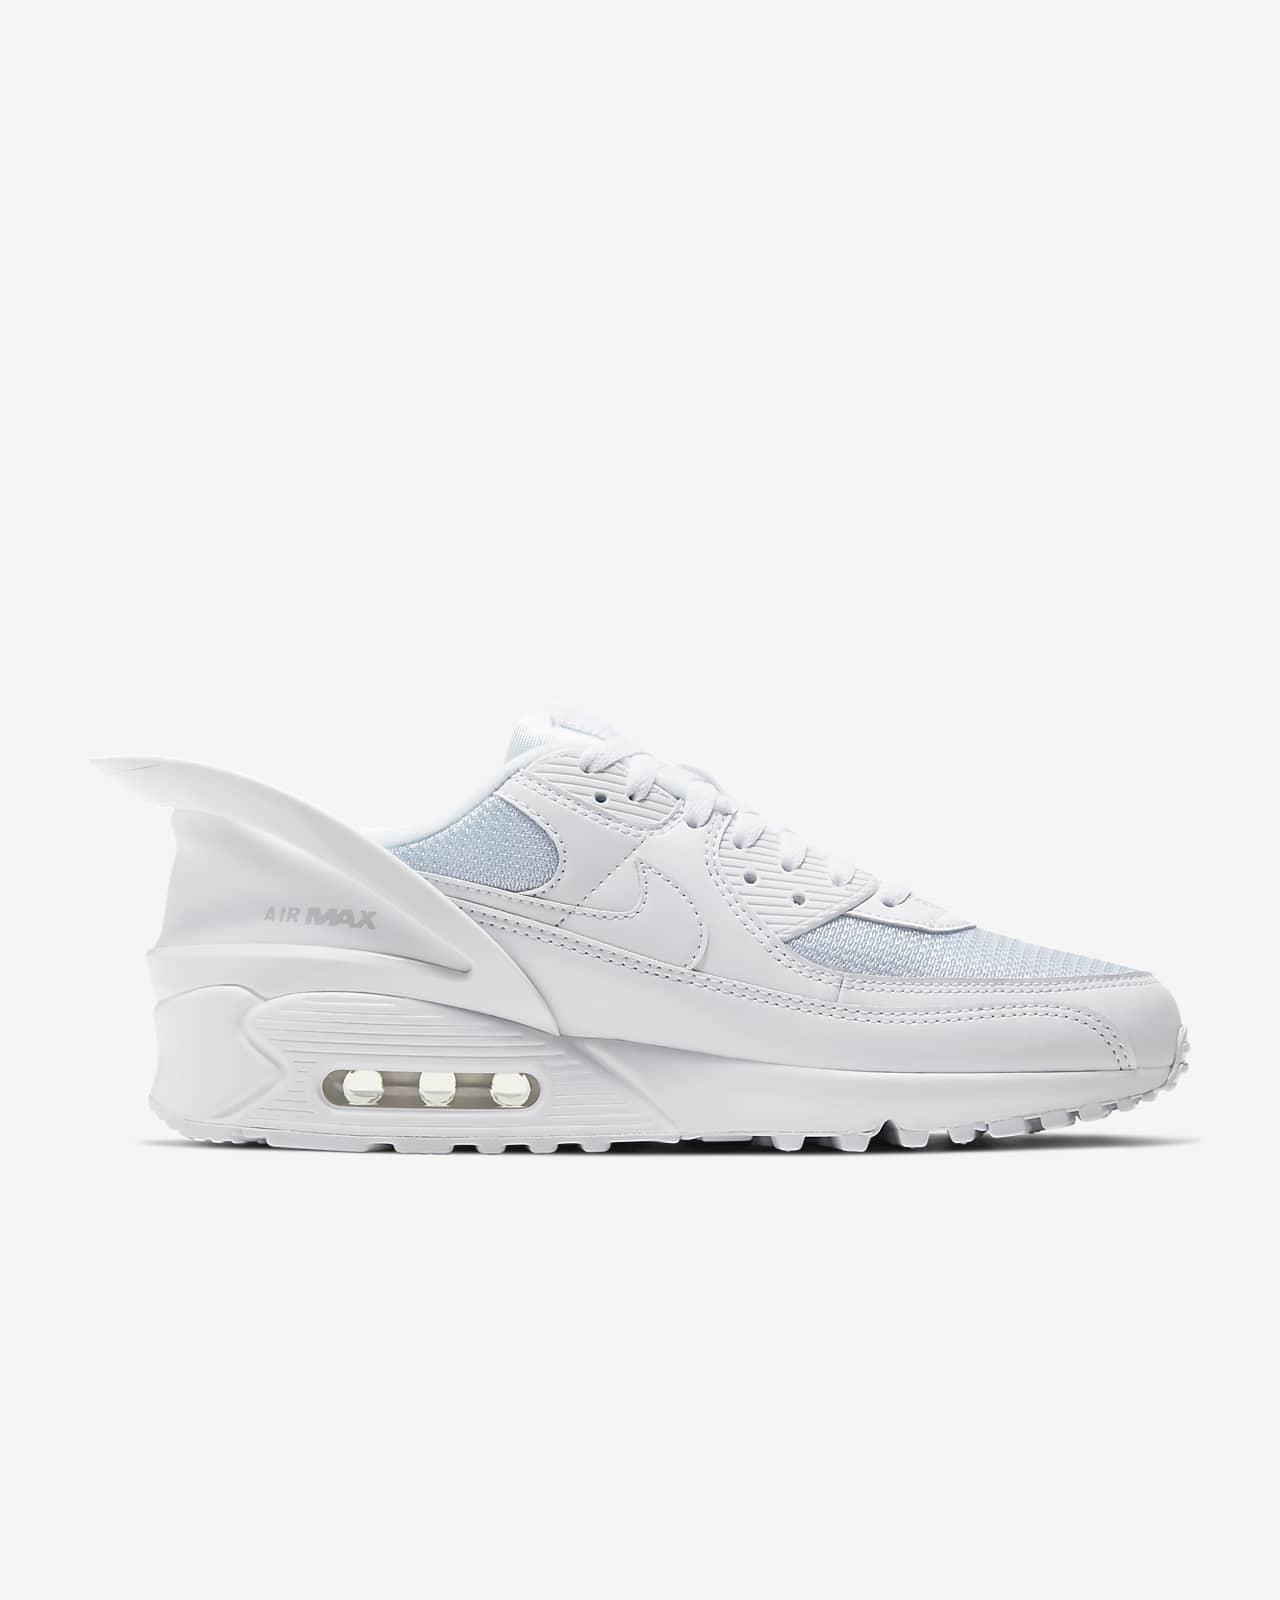 Nike Air Max 90 FlyEase Shoe